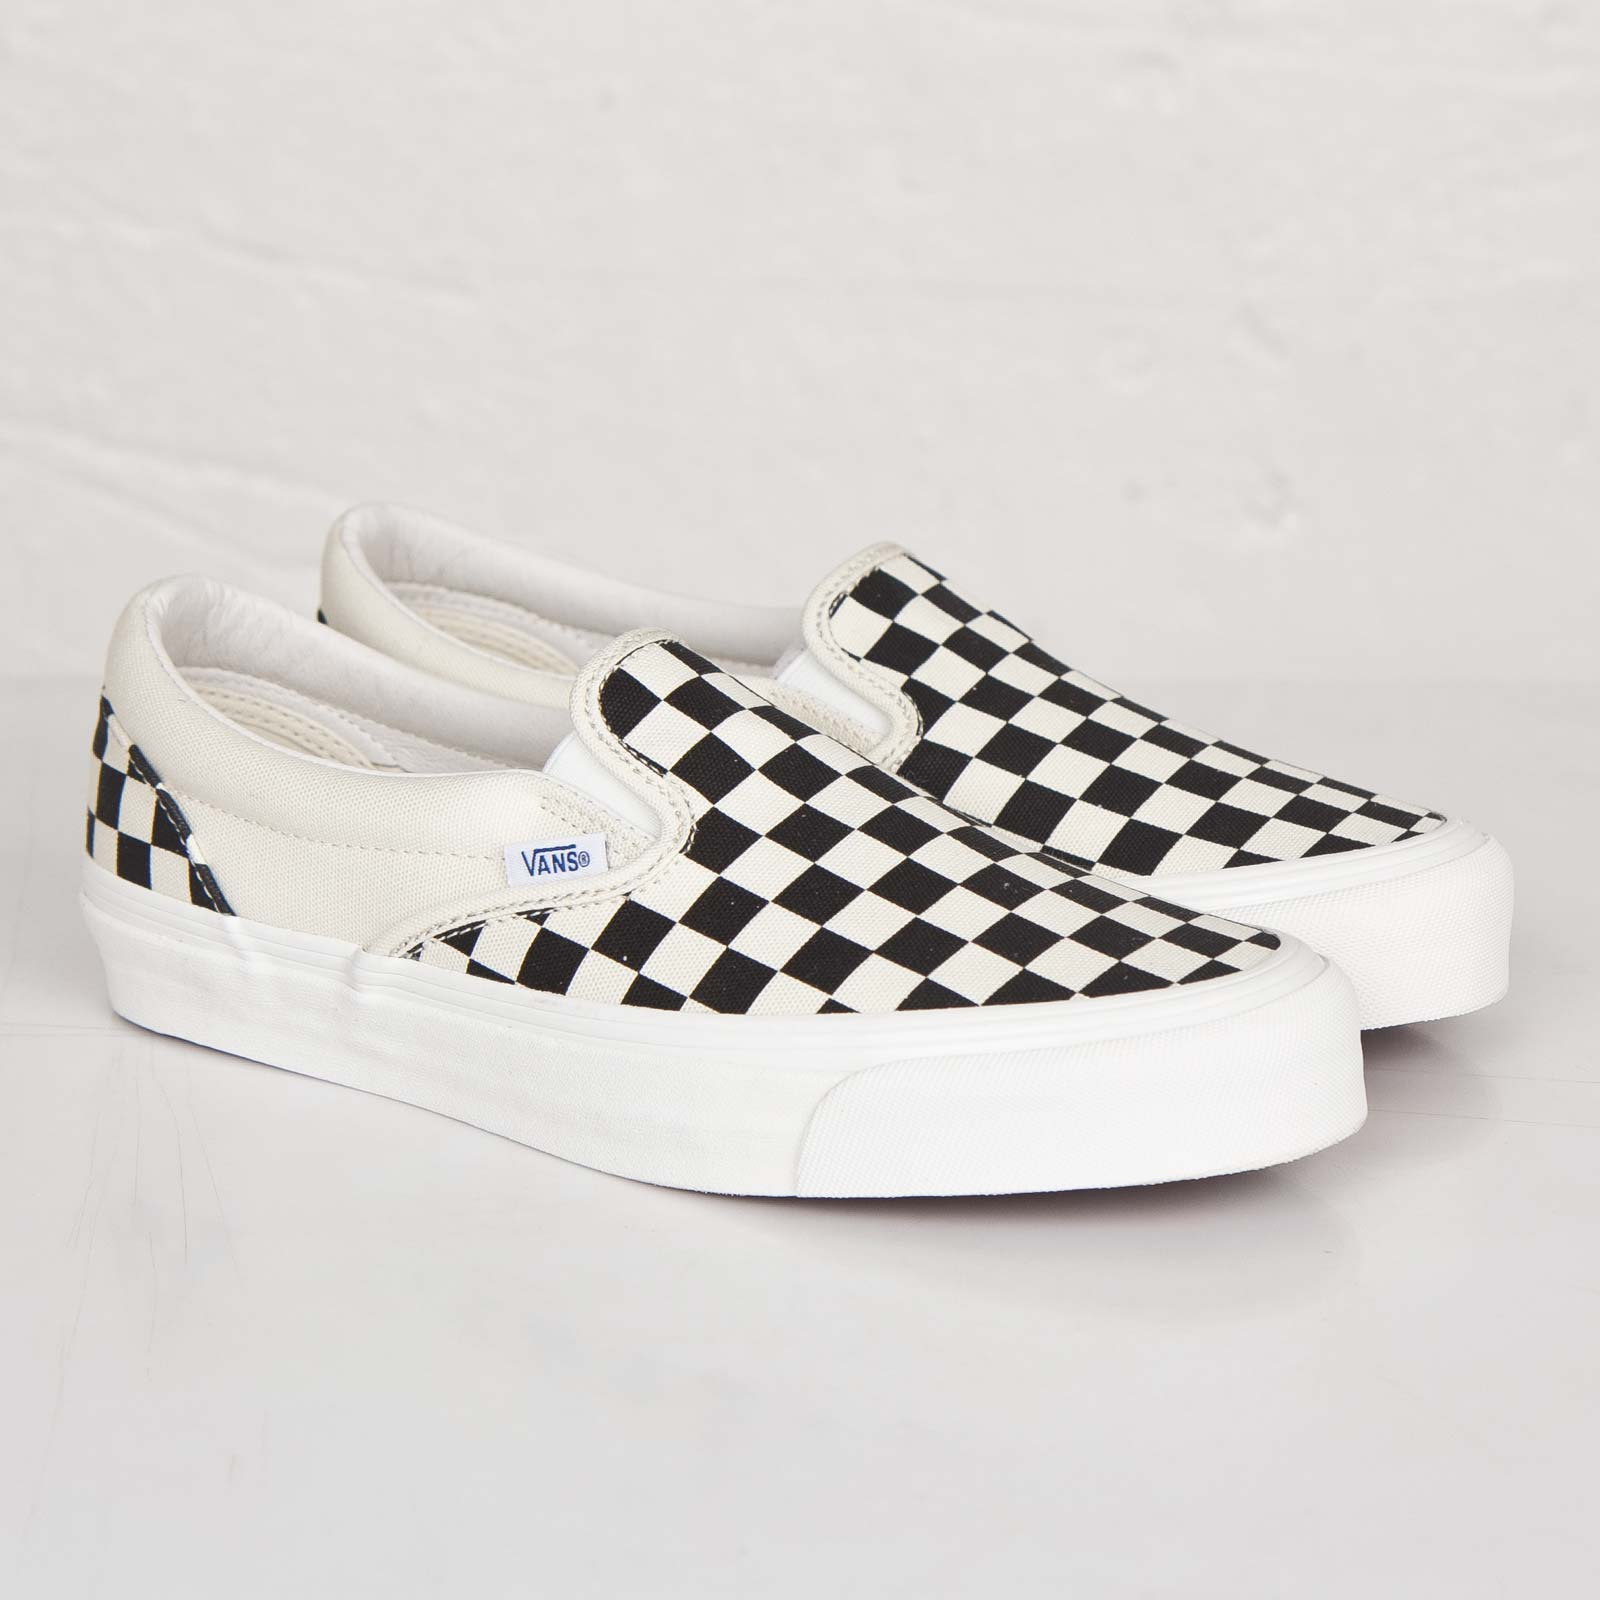 25b6030064 Vans OG Classic Slip-On DO NOT USE - Udff8l - Sneakersnstuff ...